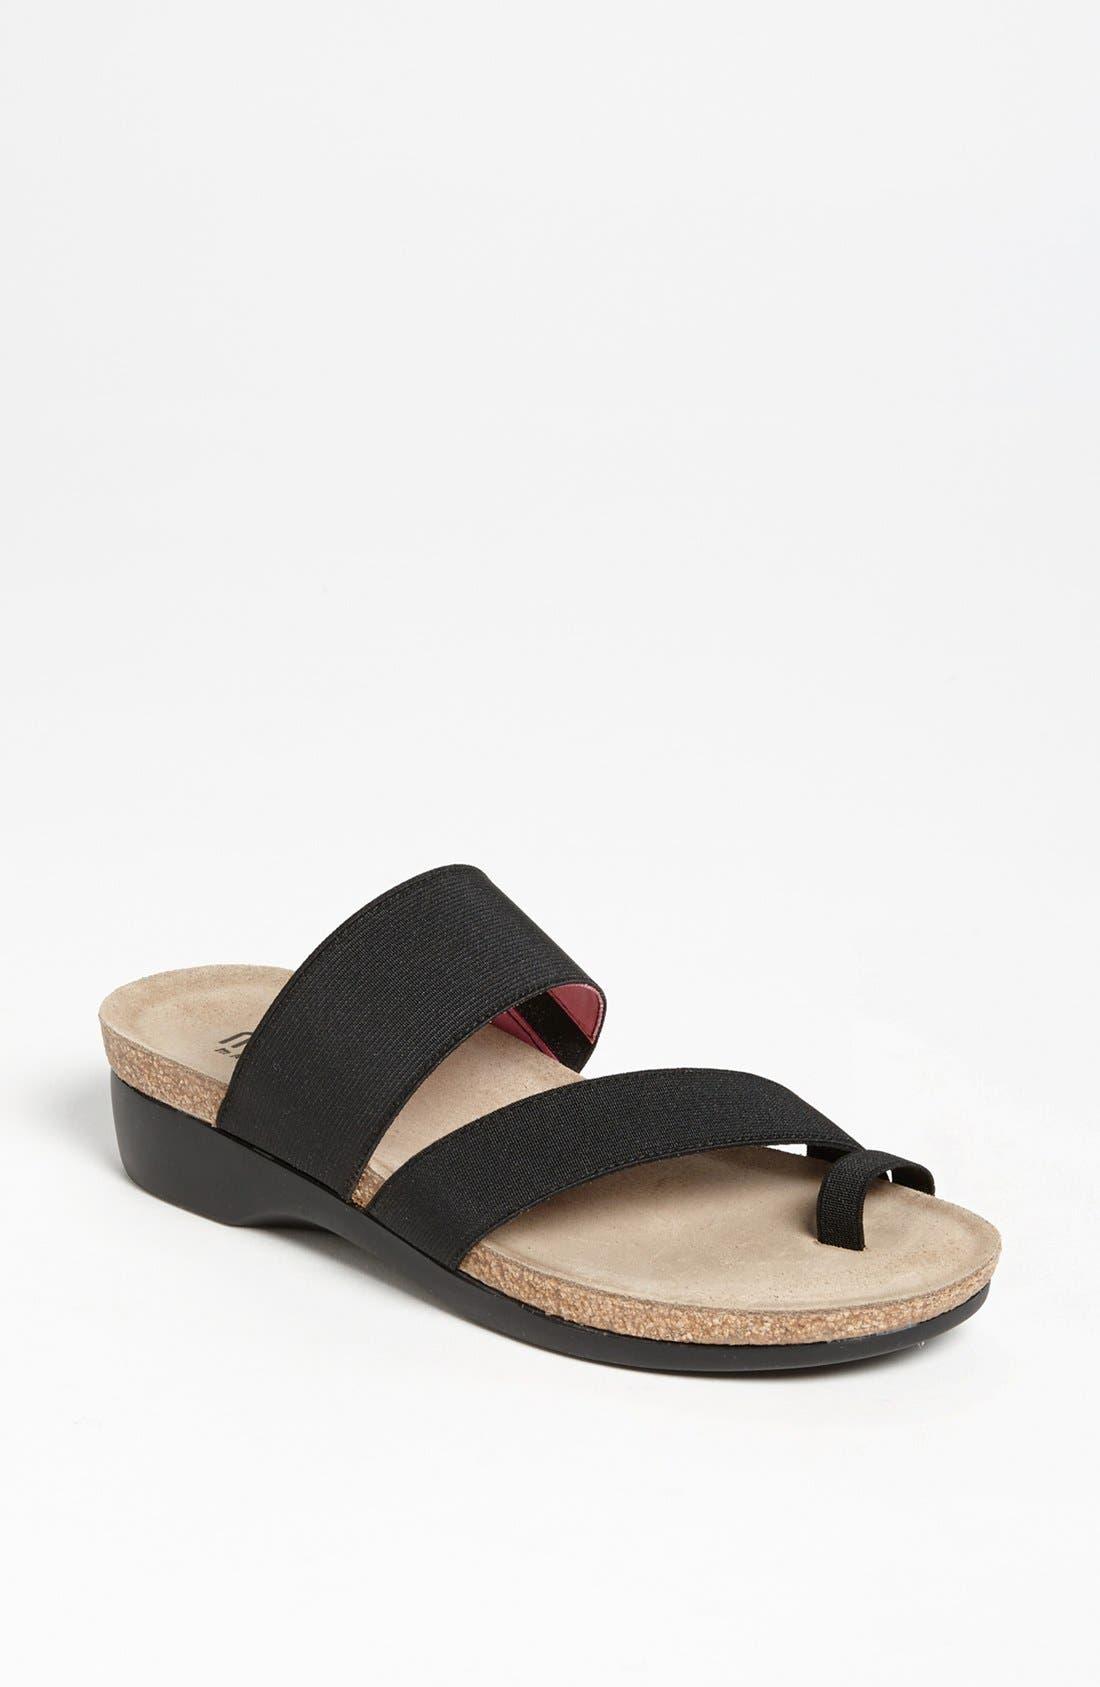 'Aries' Sandal,                             Main thumbnail 1, color,                             Black